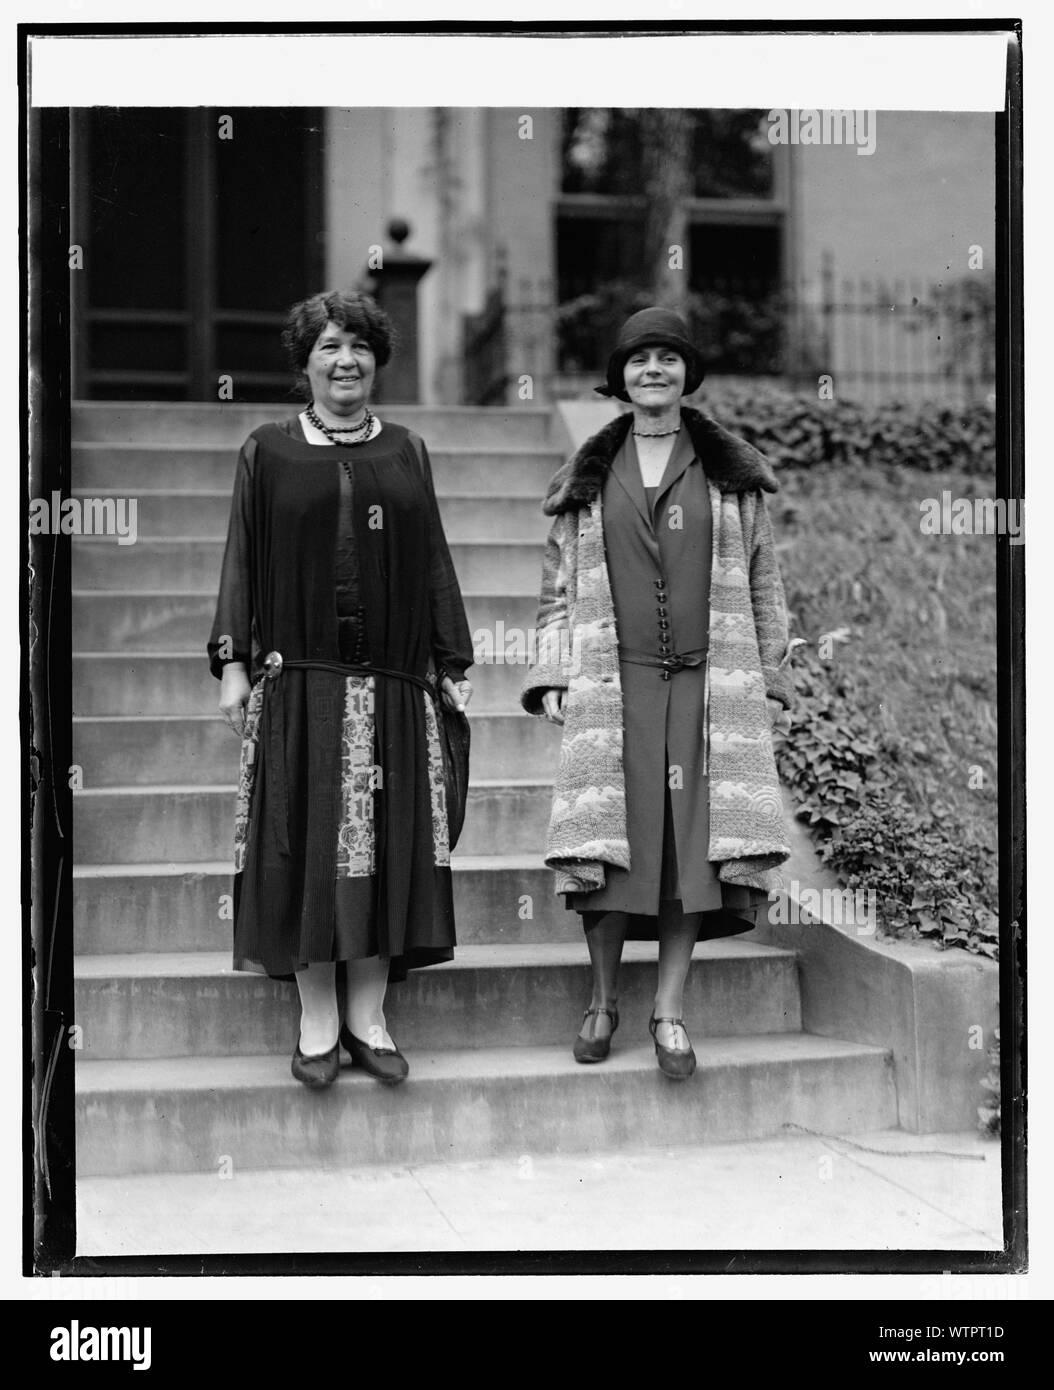 Mme Emmeline Pethick-Lawrence & Mme Jacob Riis, 10/1/25 Banque D'Images